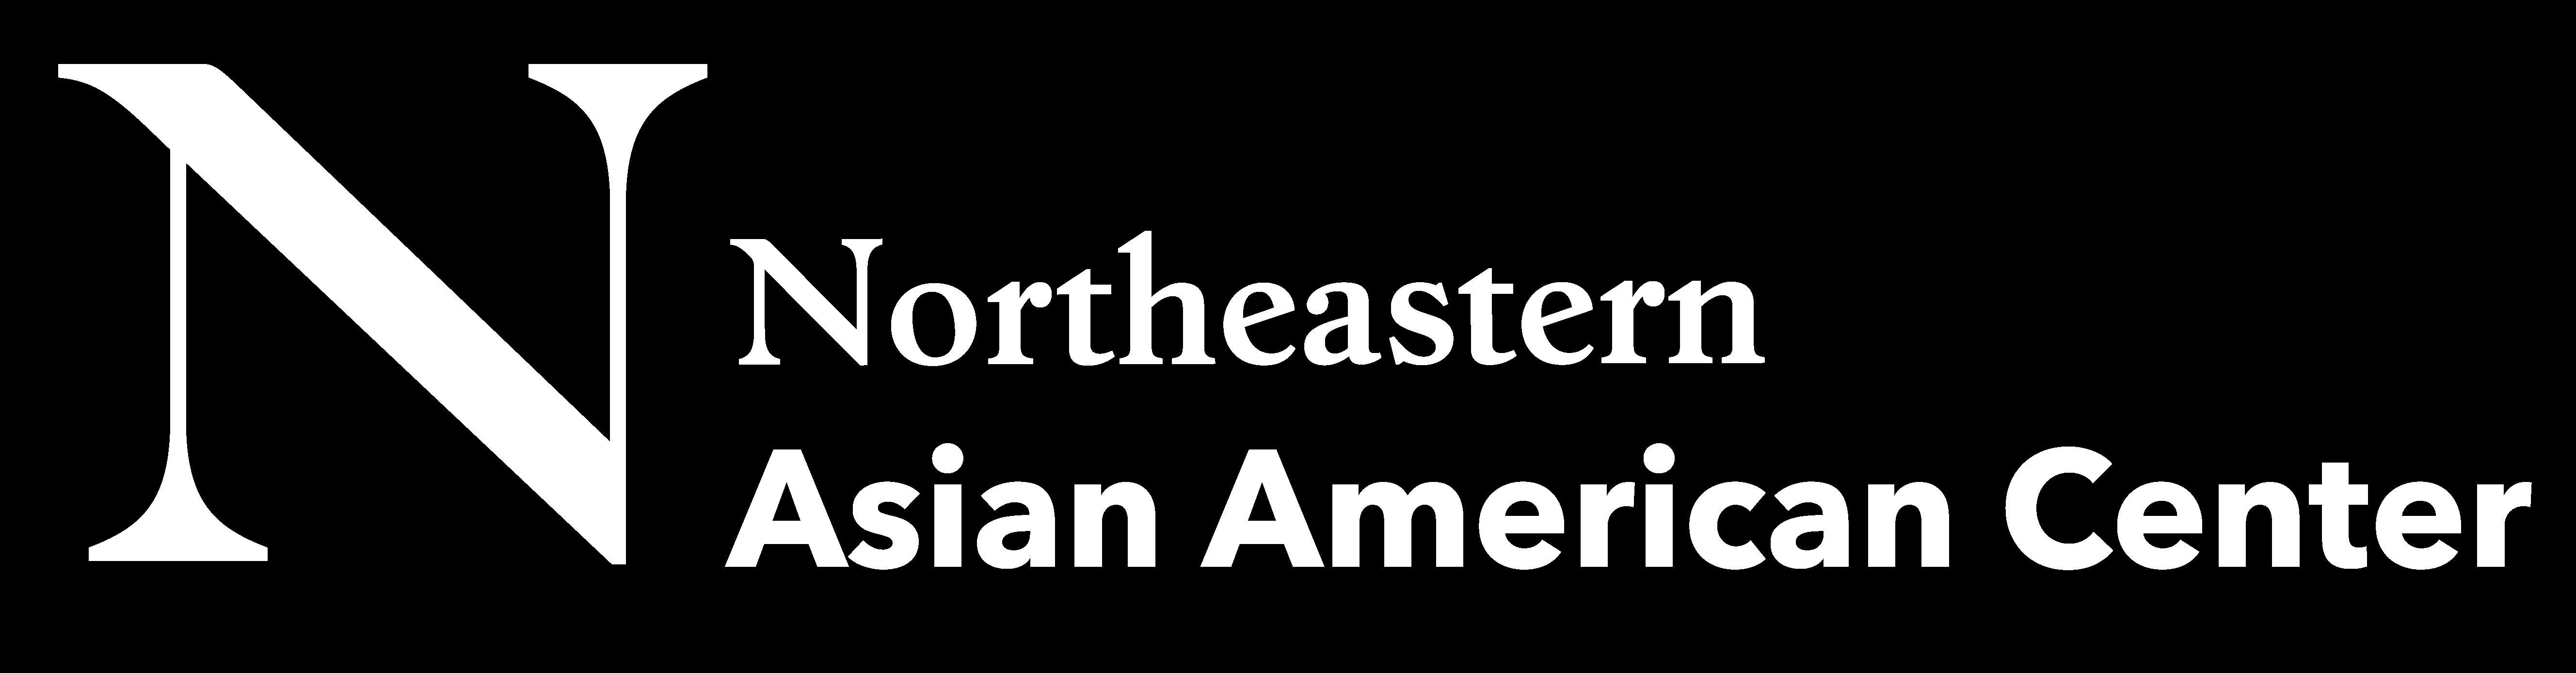 Northeastern Asian American Center White Logo